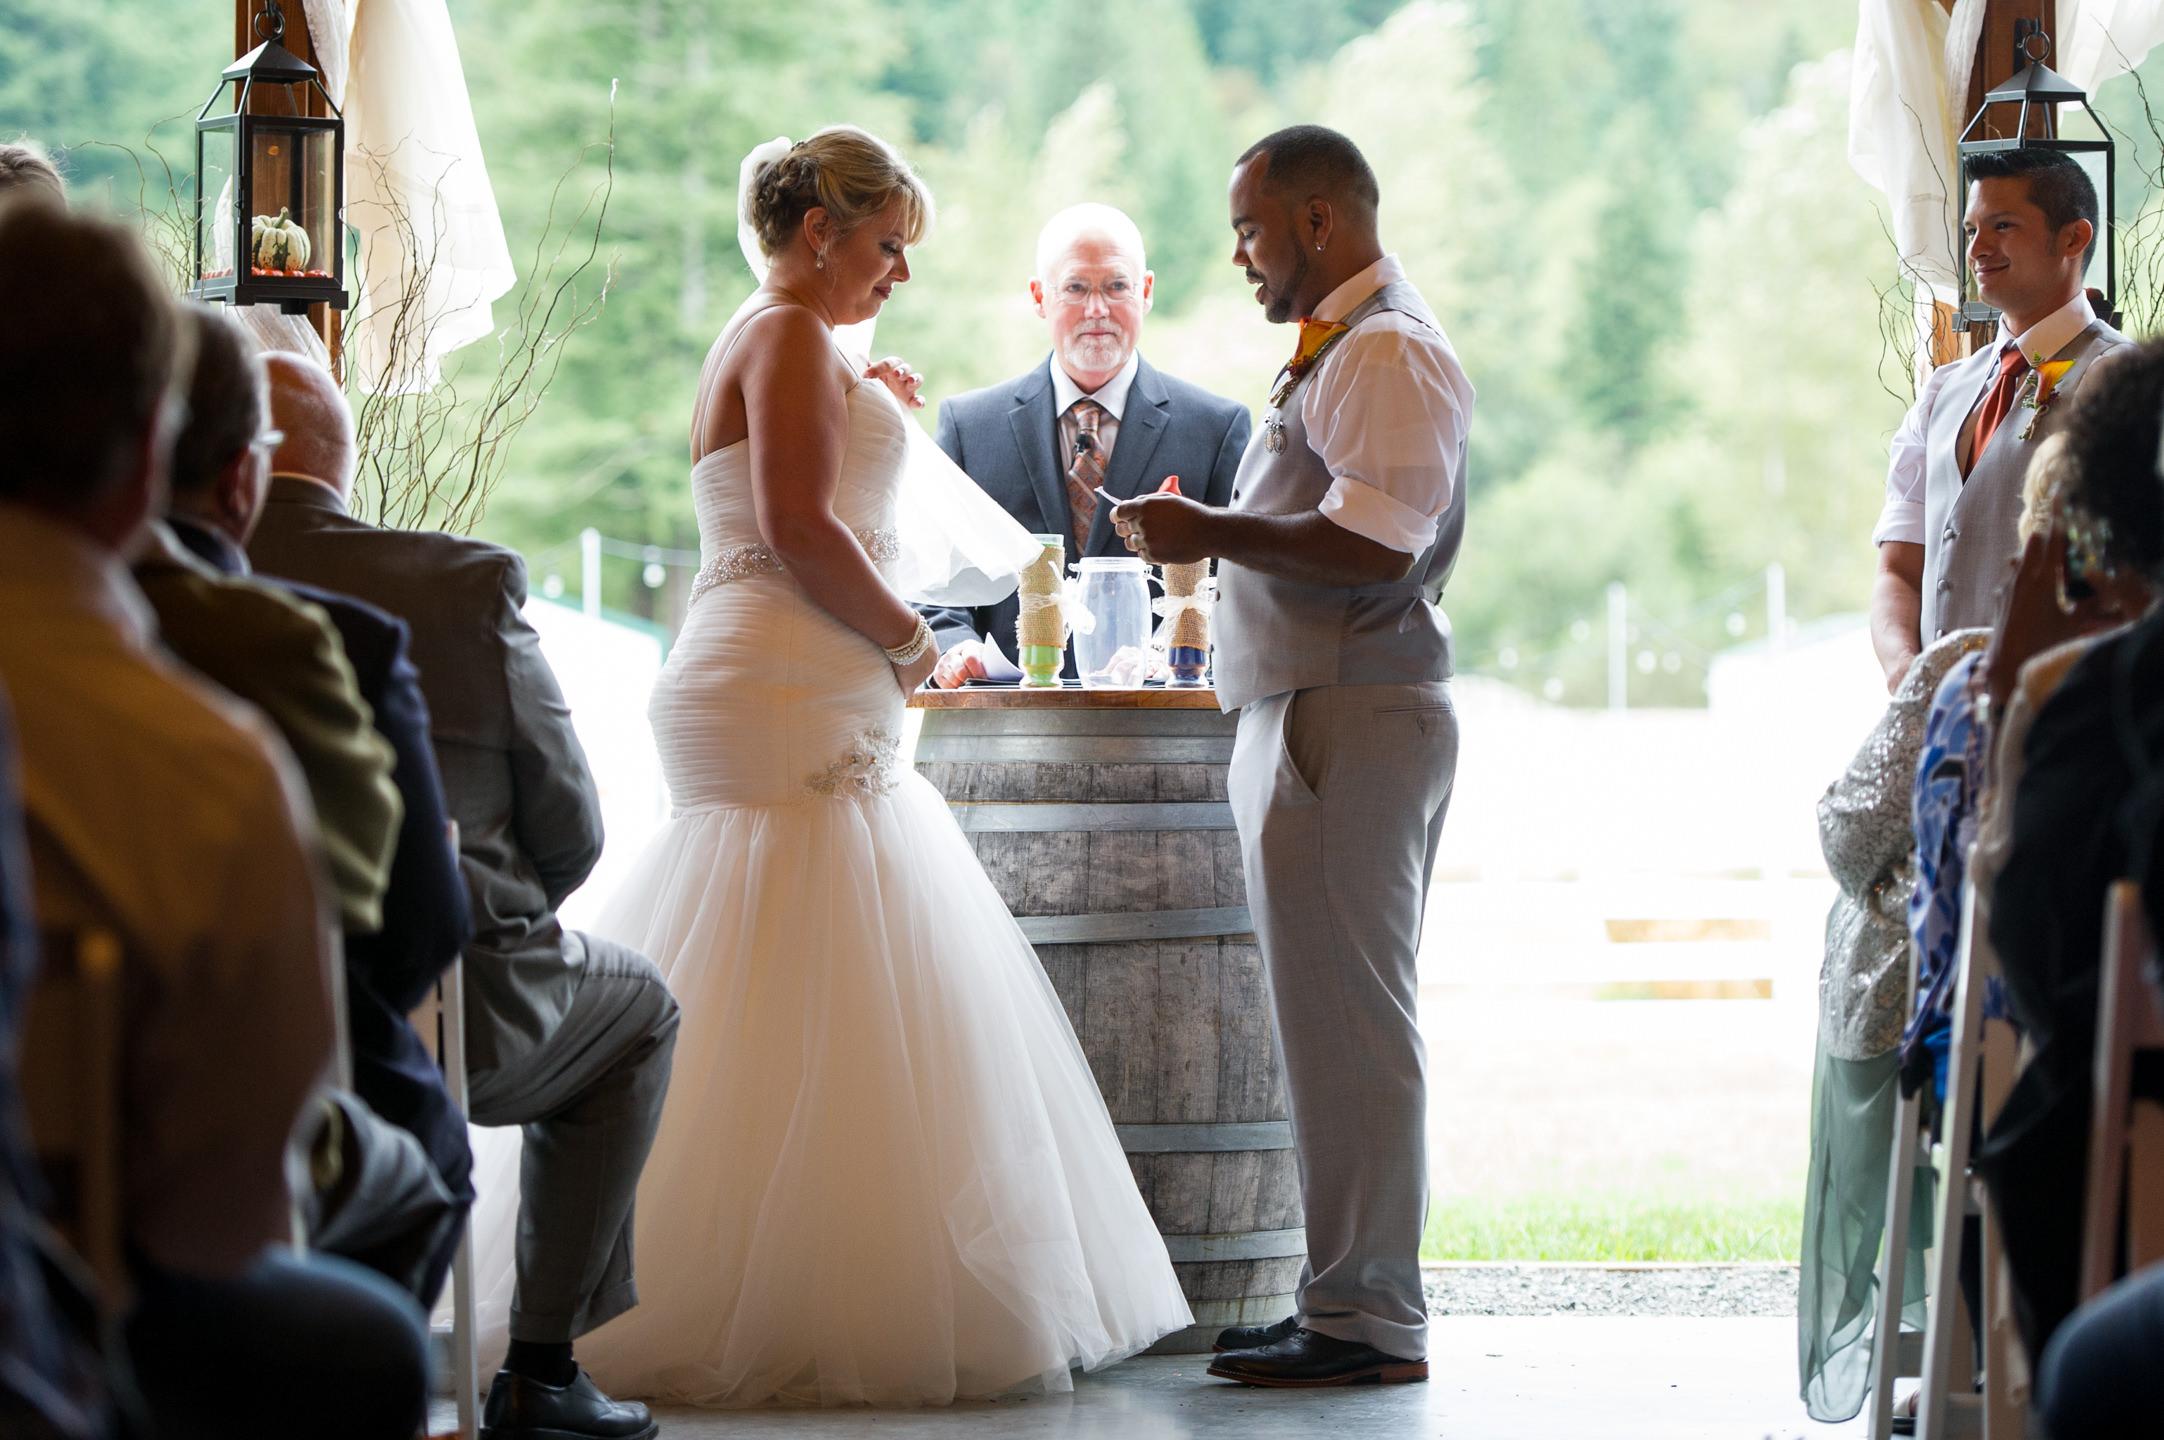 20160917_Tat_Renee and Marcus Wedding-44.jpg